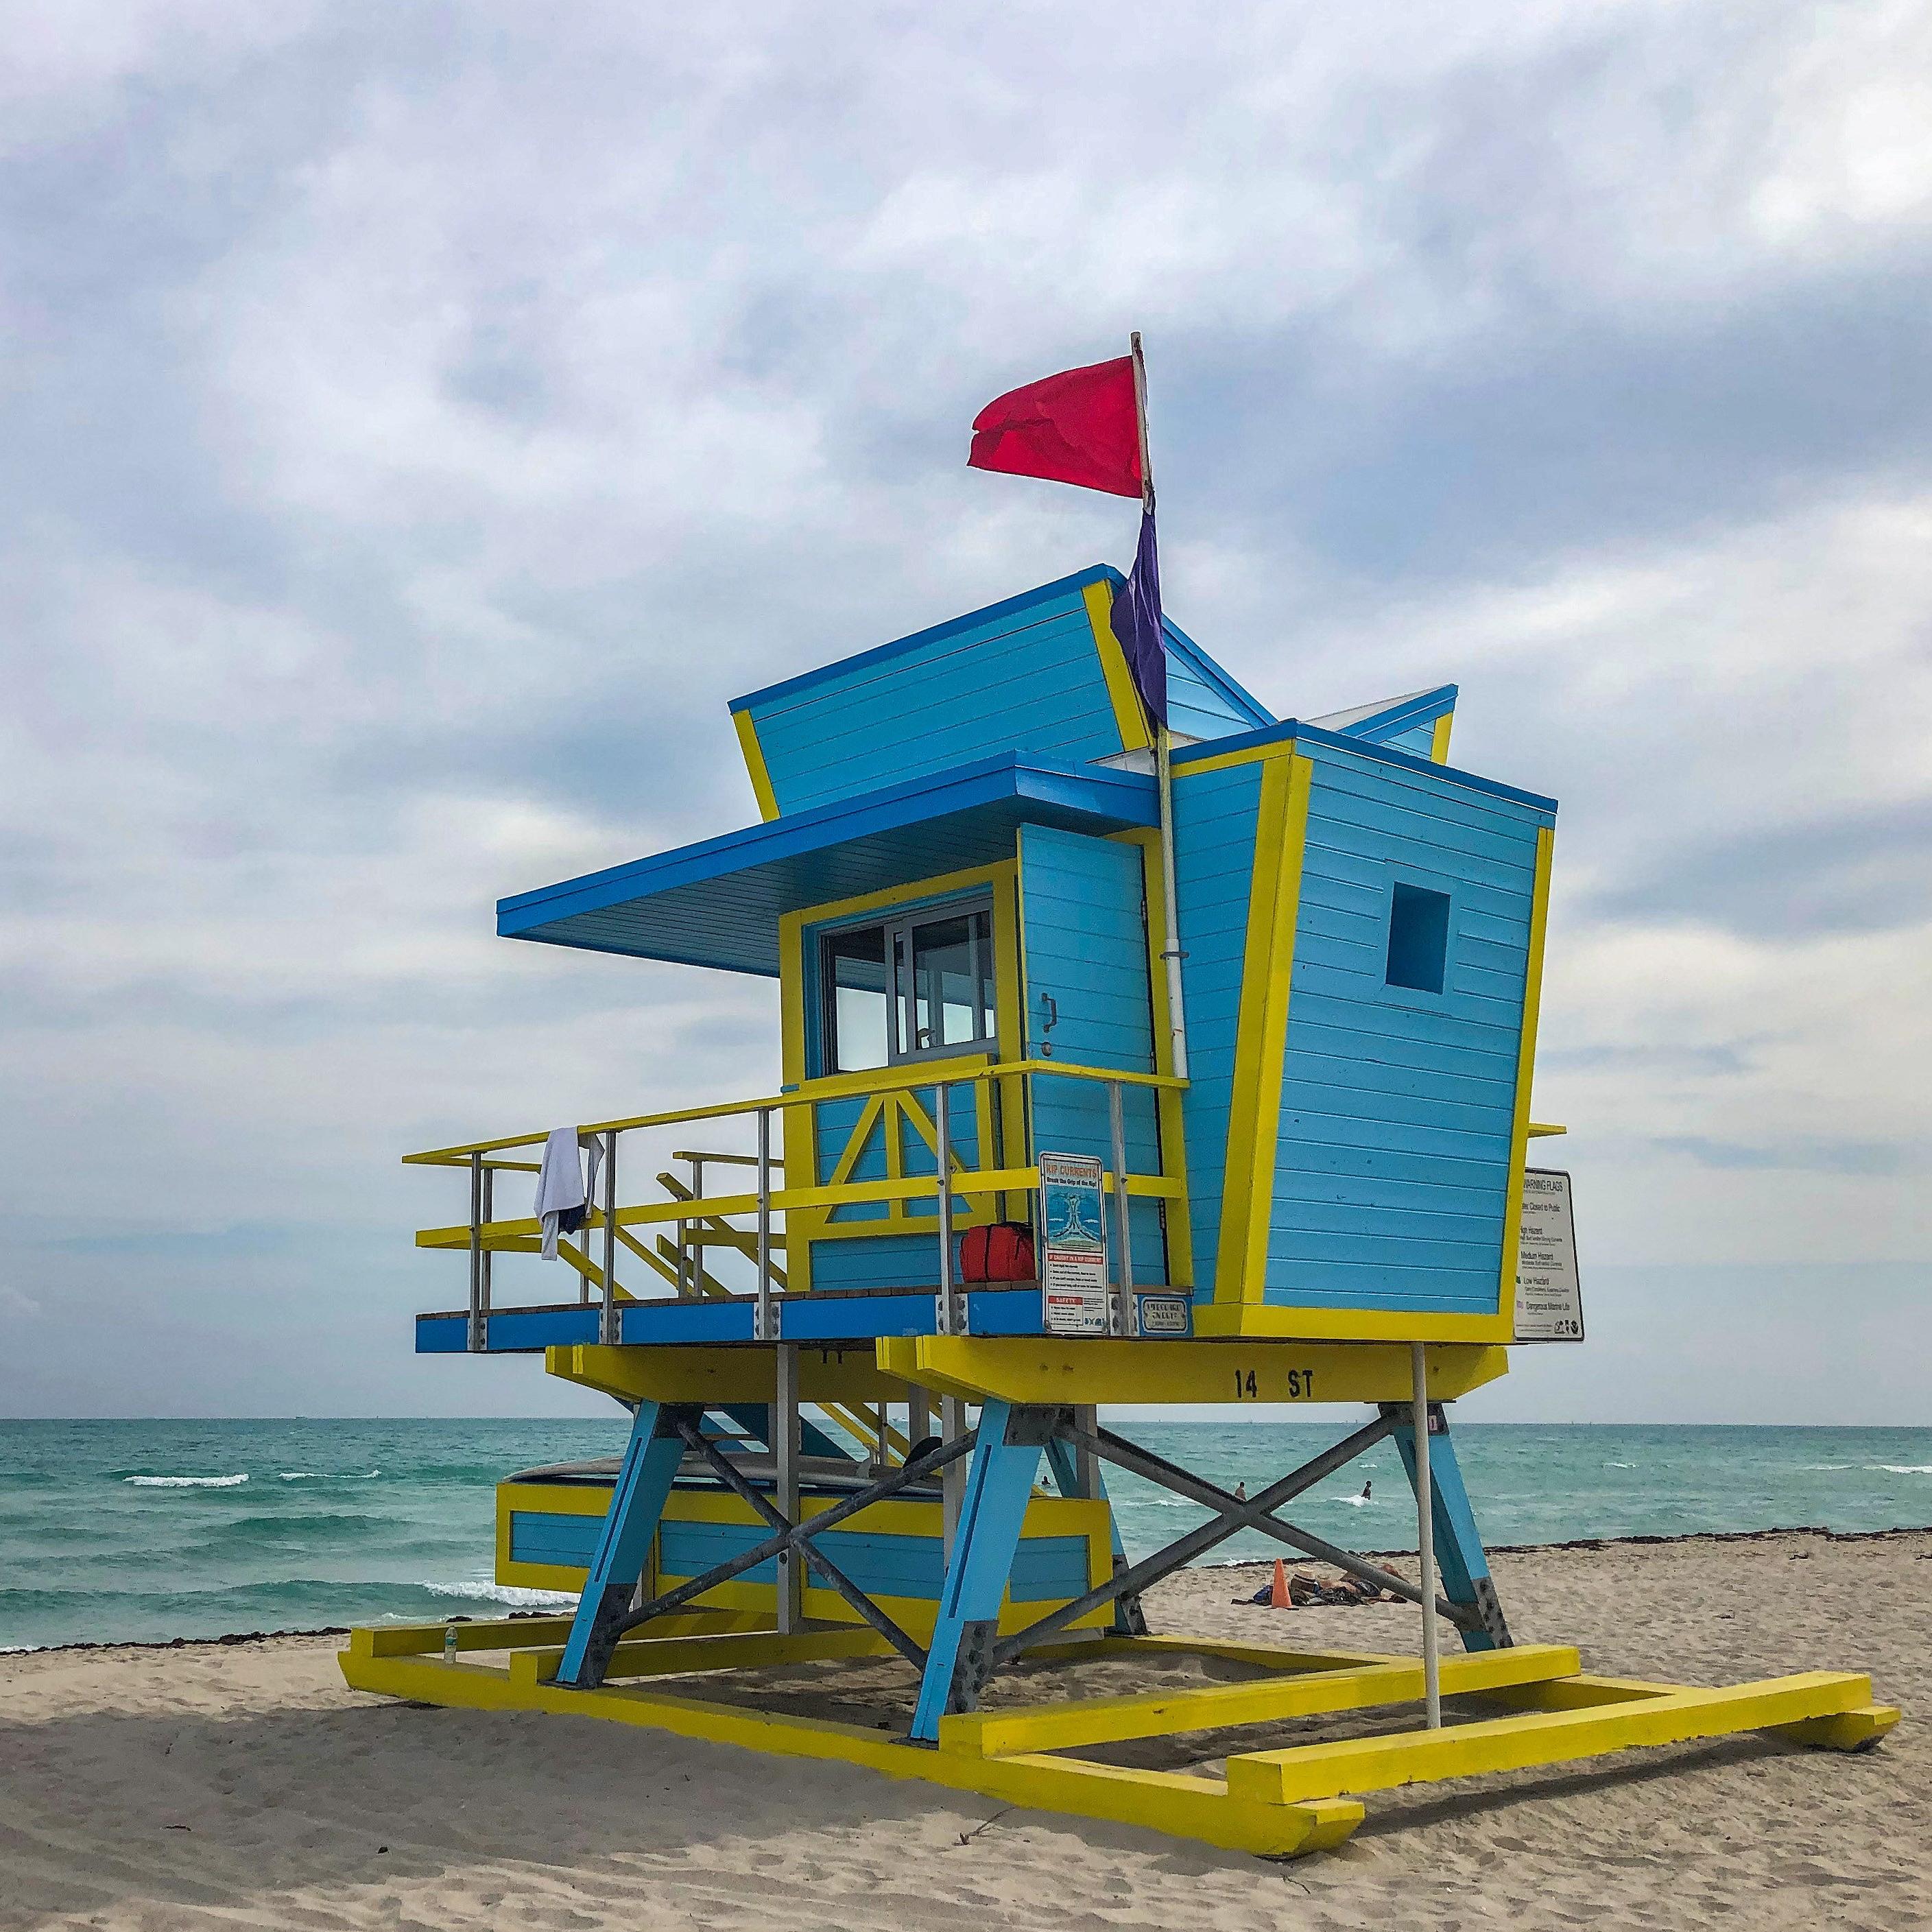 Christmas Tree Lane Los Angeles: Lifeguard Tower Miami Beach Florida